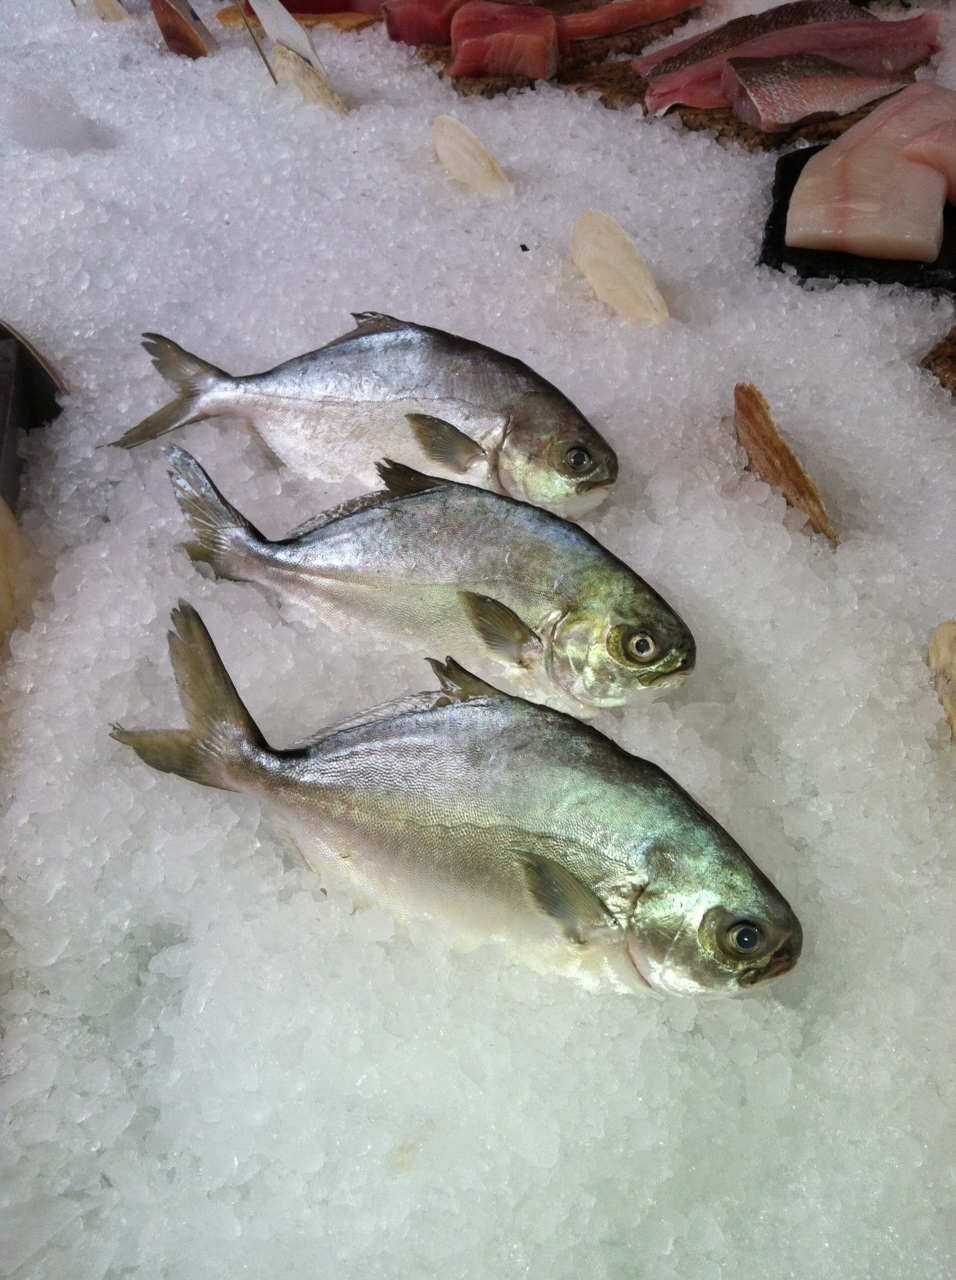 The edible ocean september 2012 for Edible freshwater fish